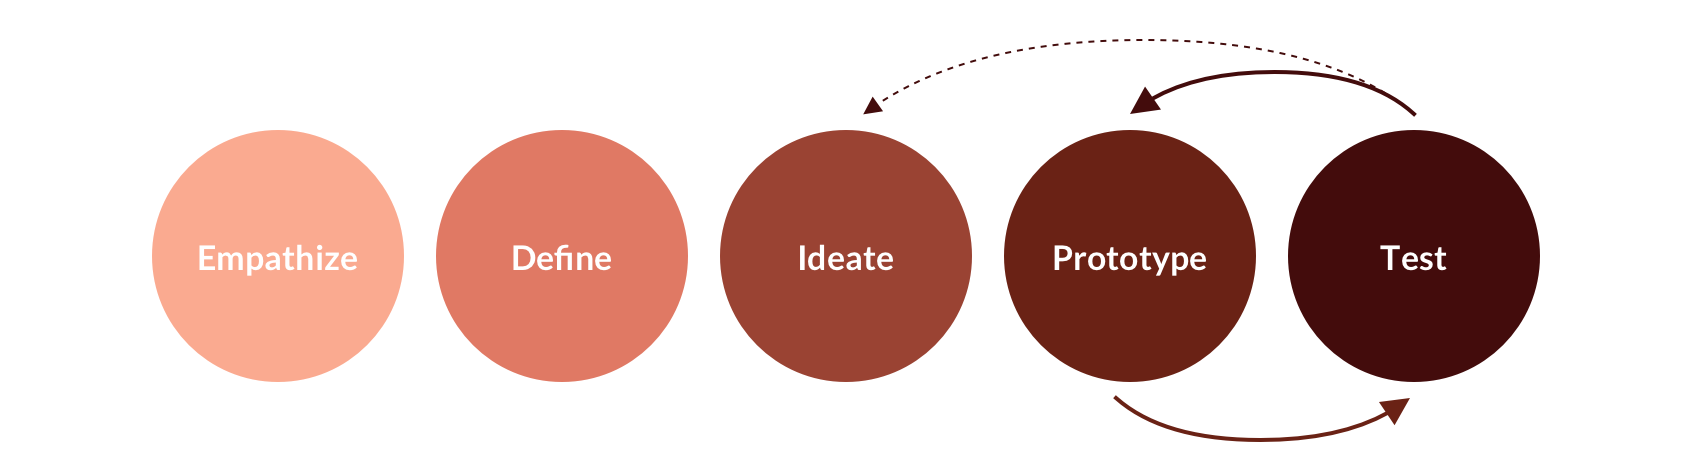 design-thinking@2x.jpg